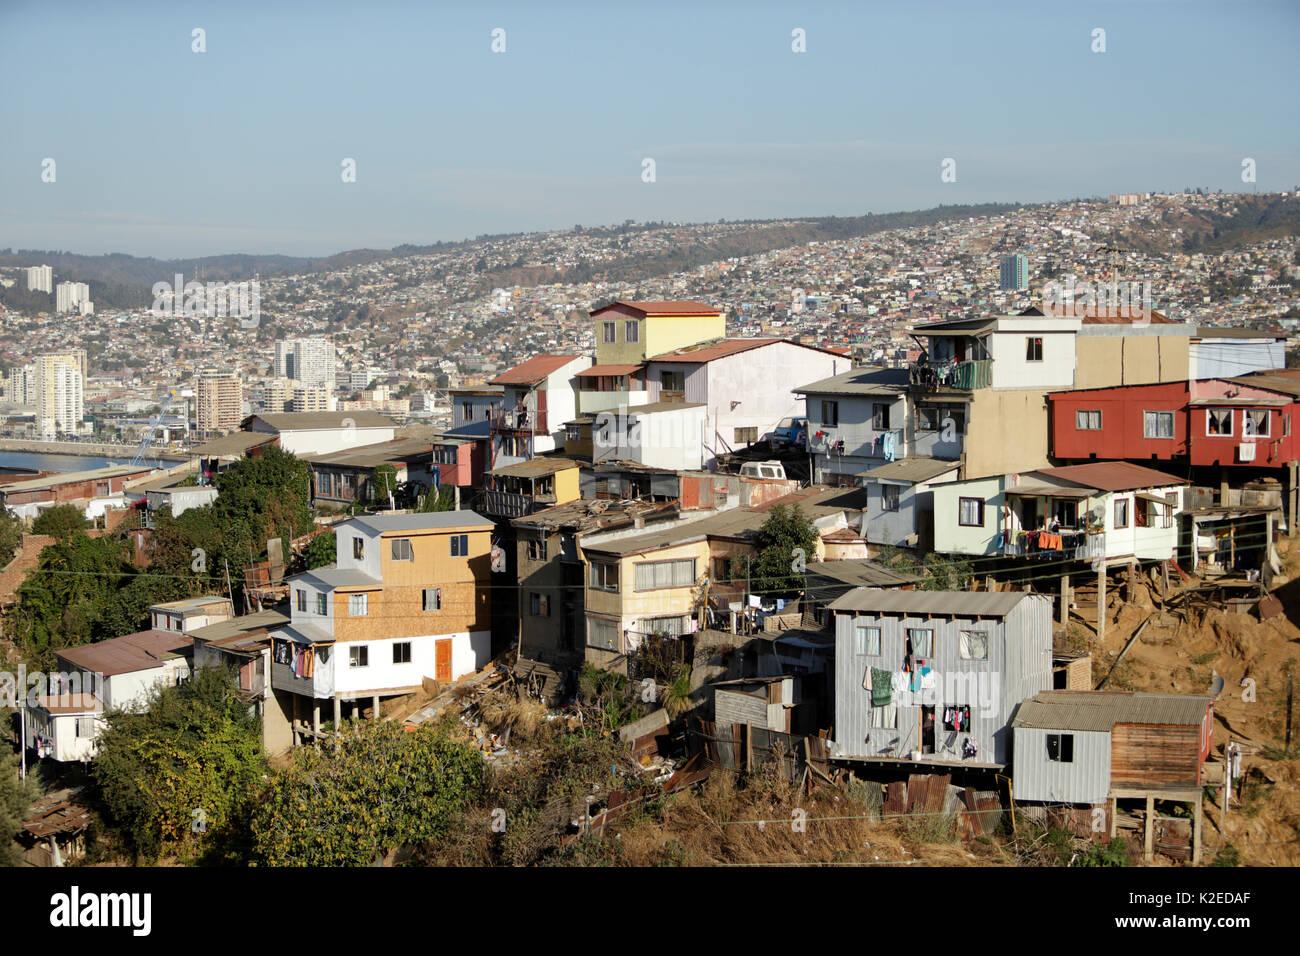 Valparaiso town, Chile, April 2016. - Stock Image